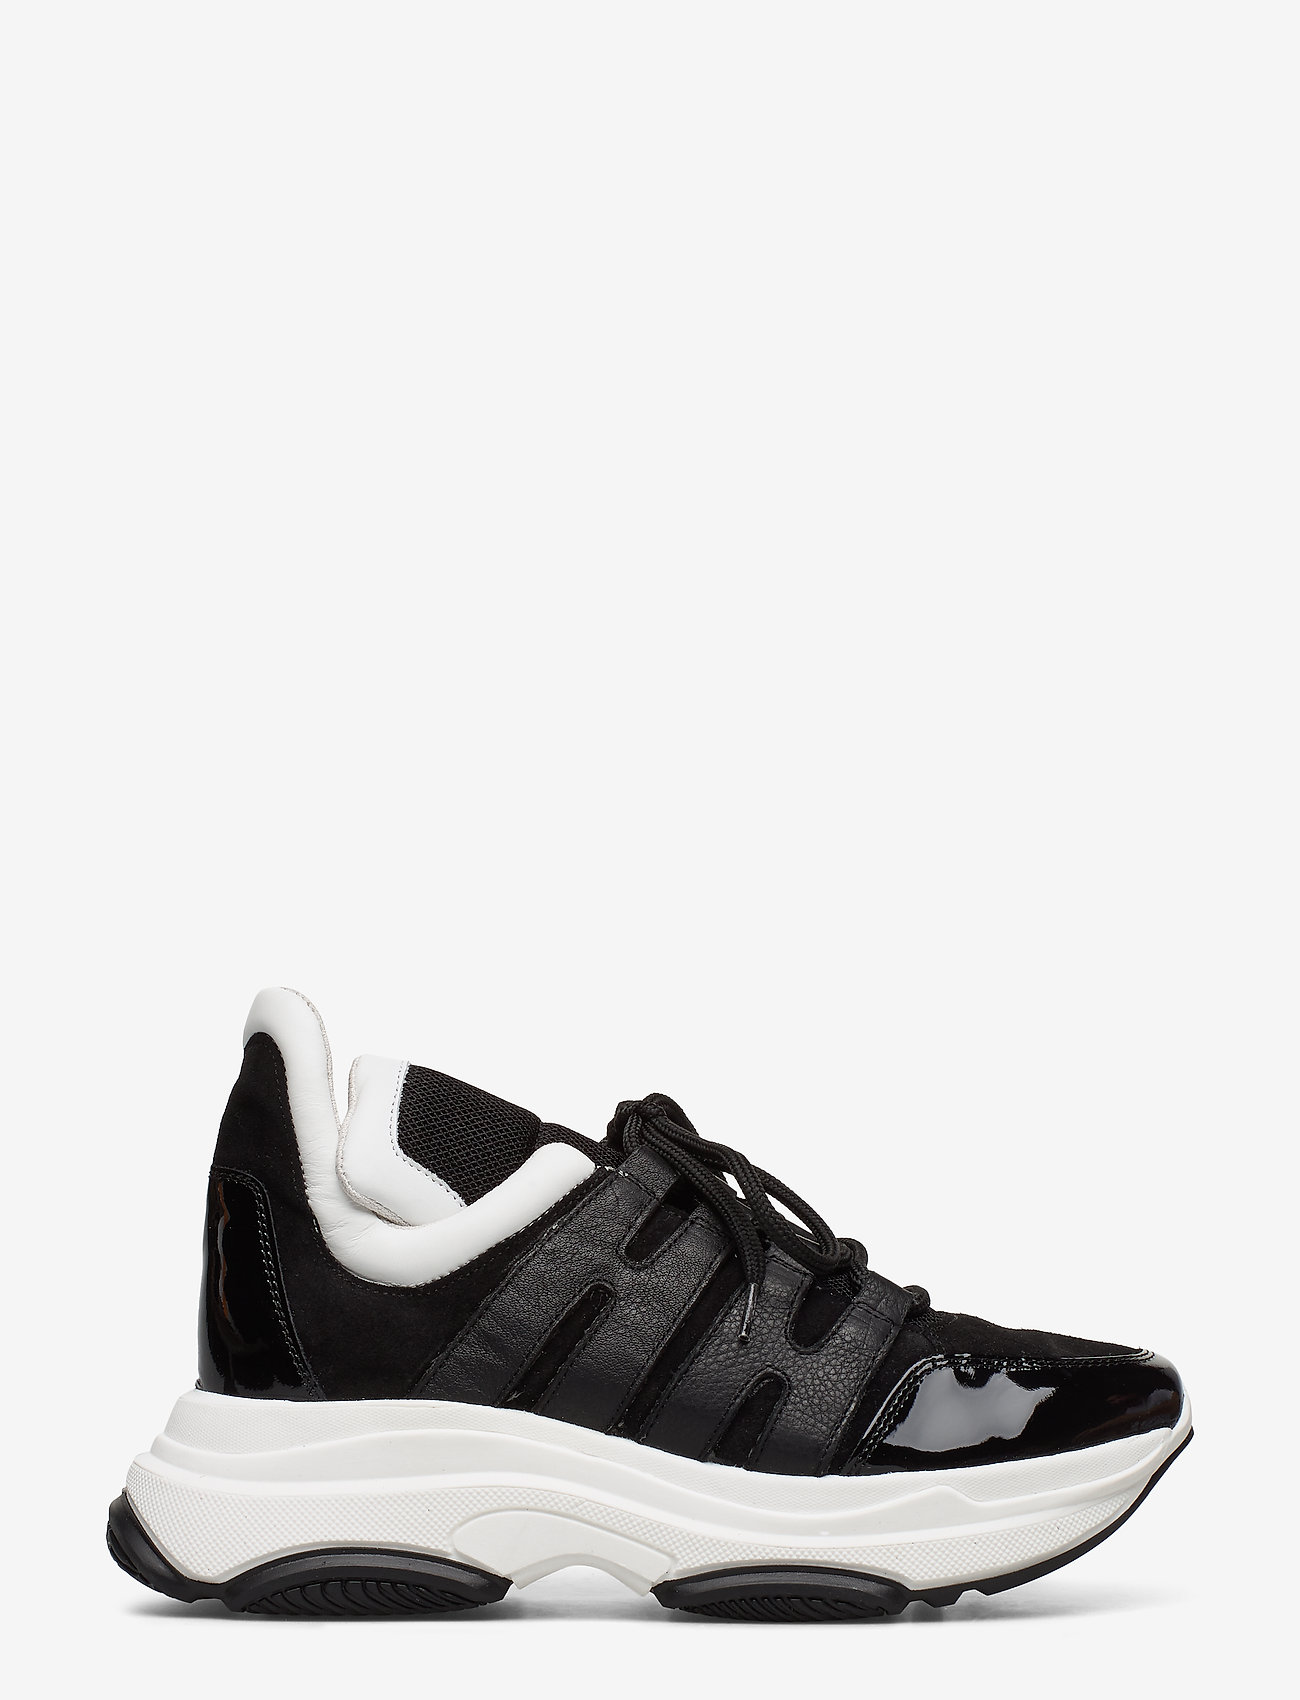 Henry Kole Silvana - Sneaker BLACK - Schuhe Billige